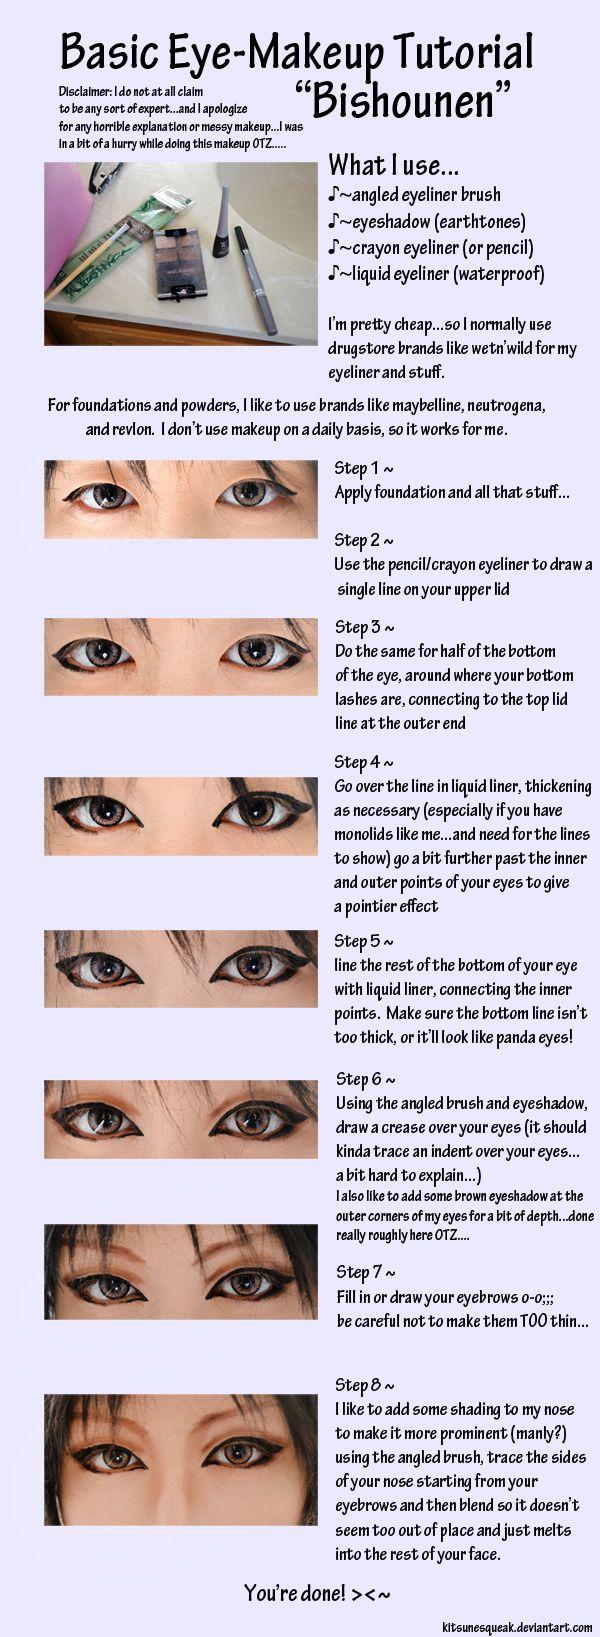 cosplay makeup tutorial | eye_makeup_tutorial___pretty_boy_by_kitsunesqueak-d4my...